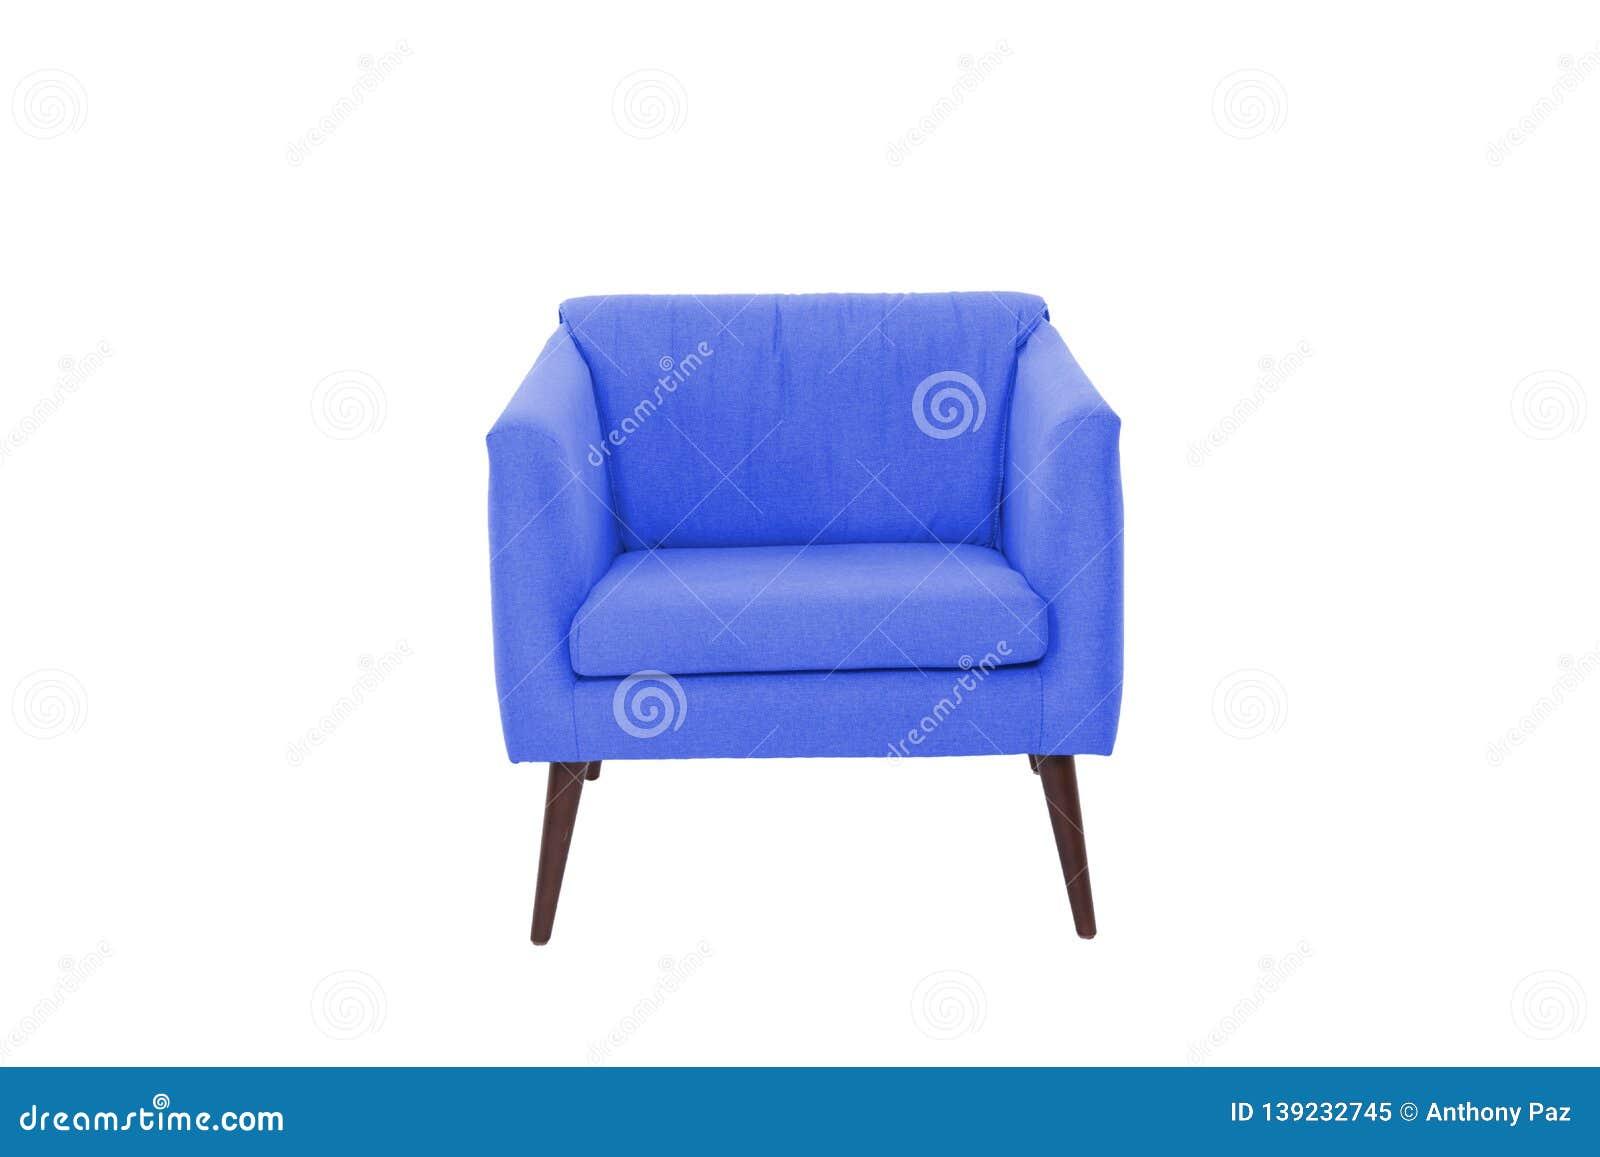 fabric wood armchair modern designer chair white background texture